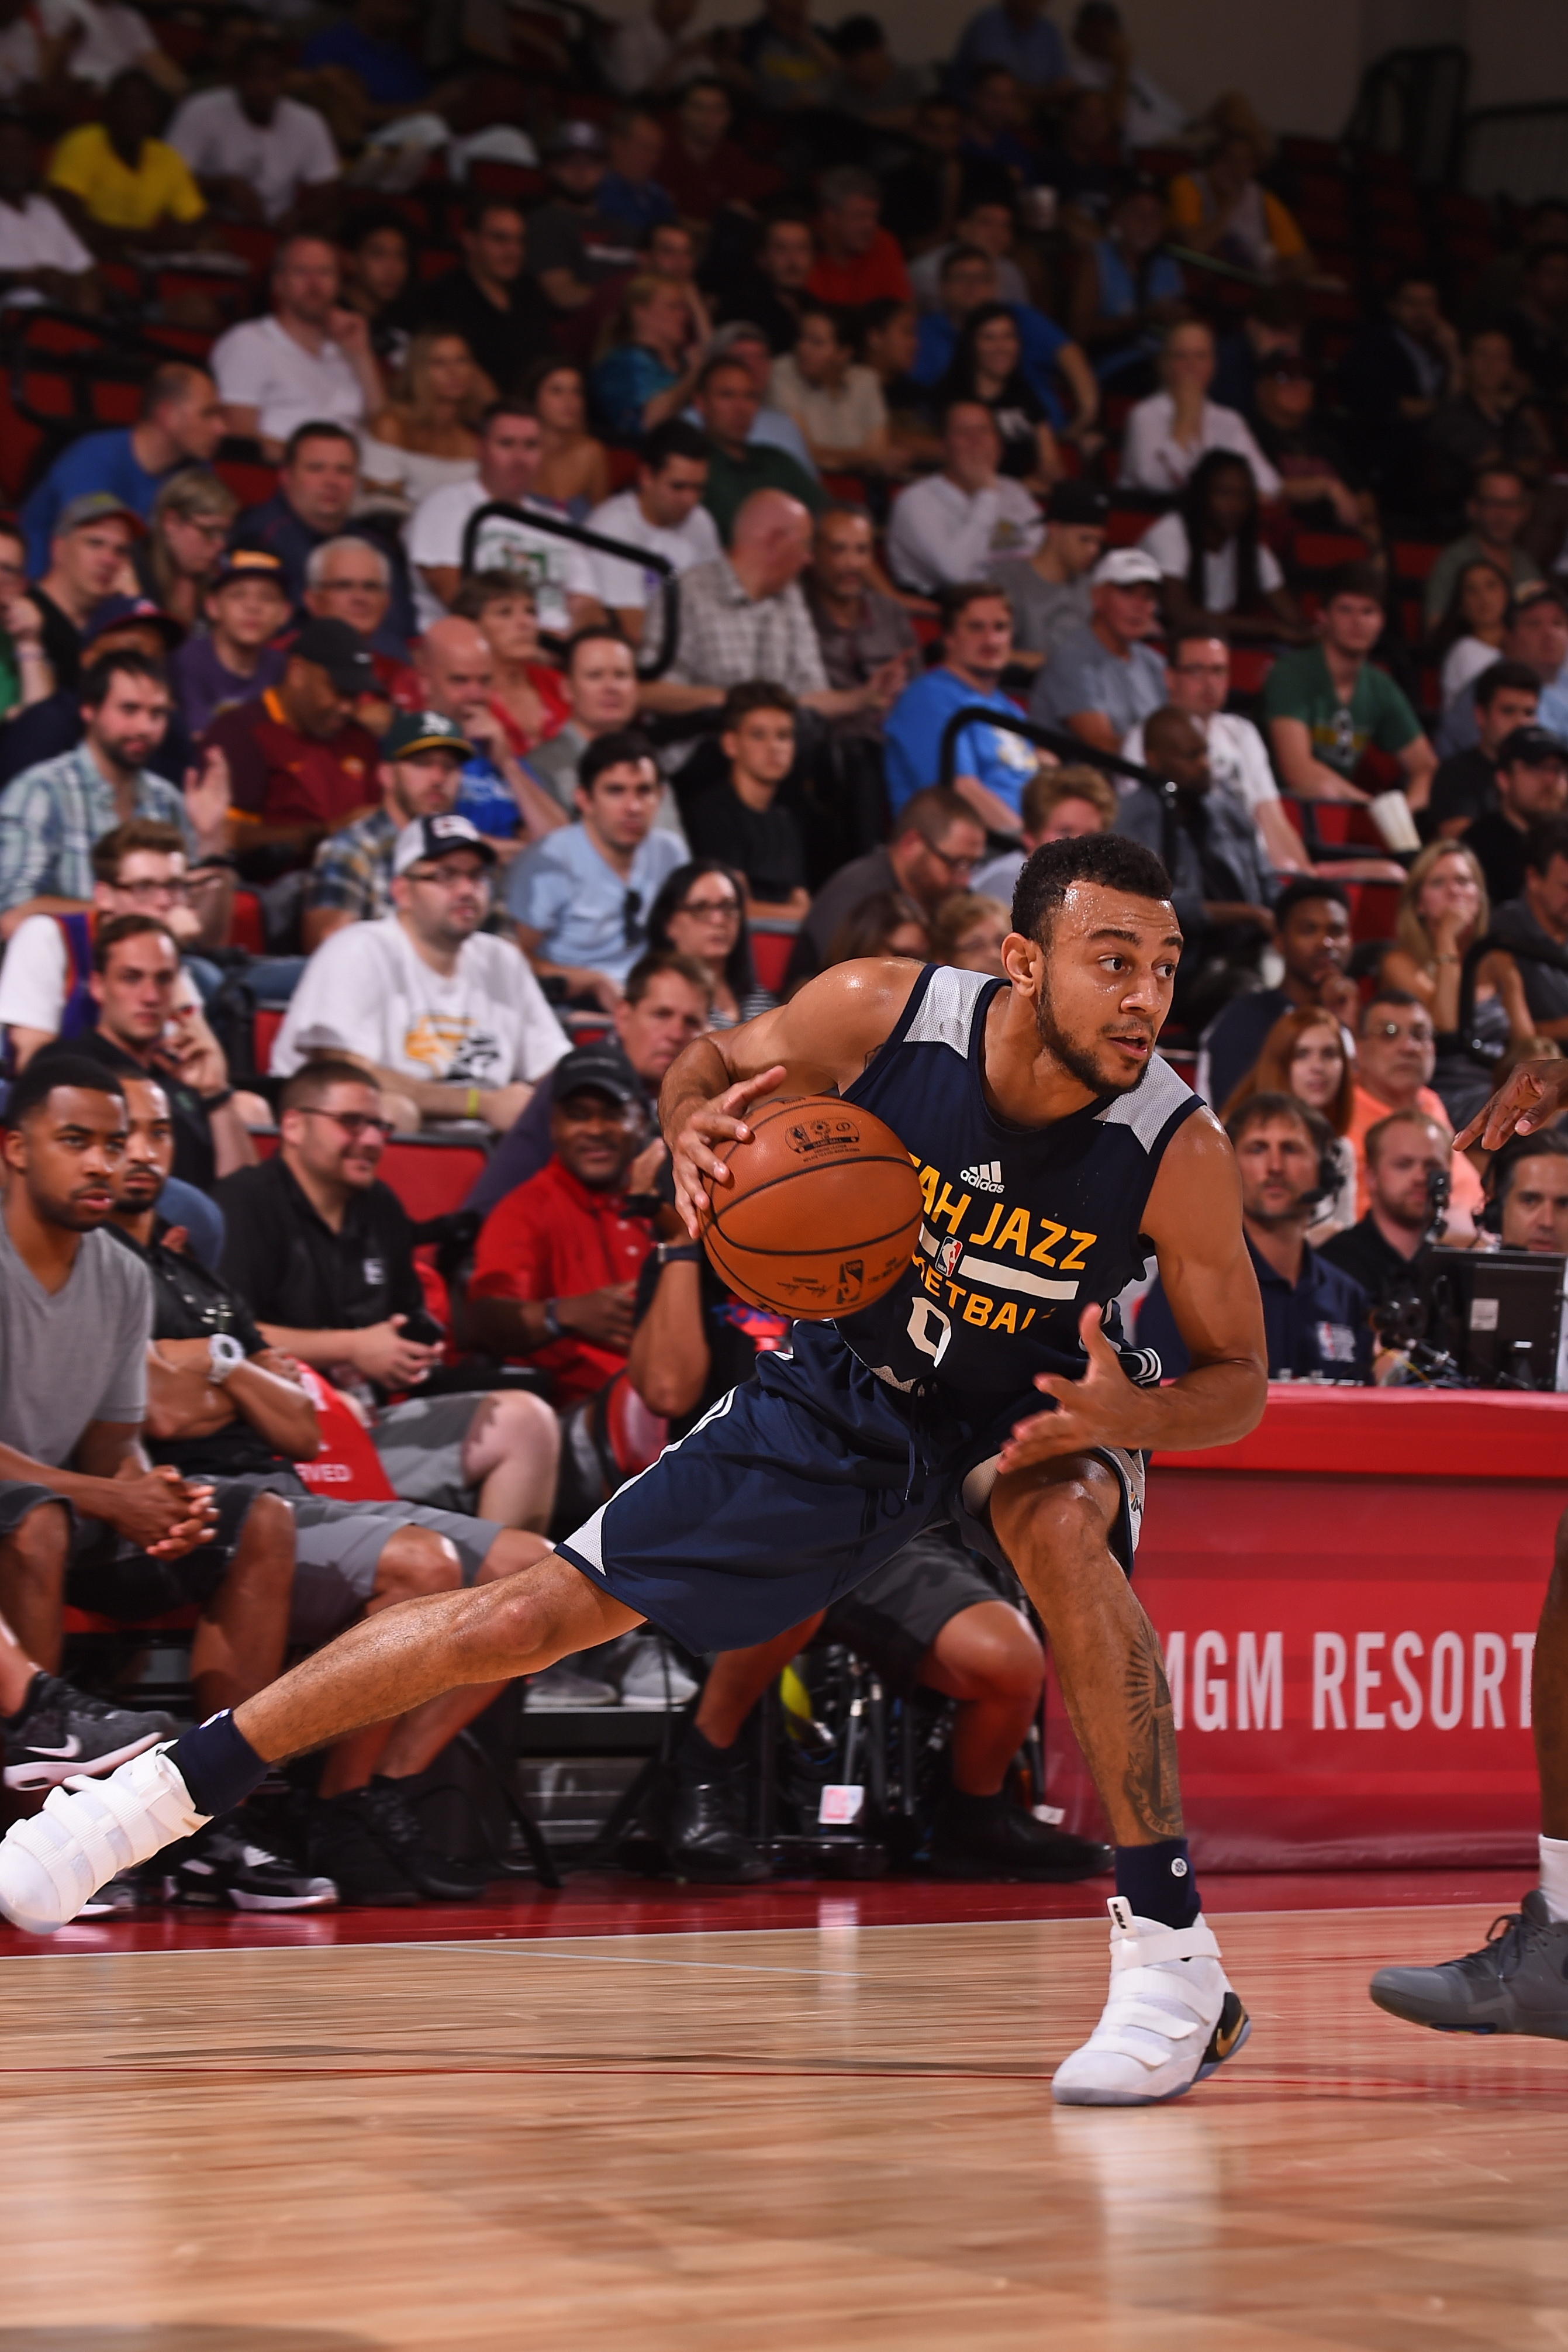 2017 Las Vegas Summer League - Utah Jazz v Phoenix Suns